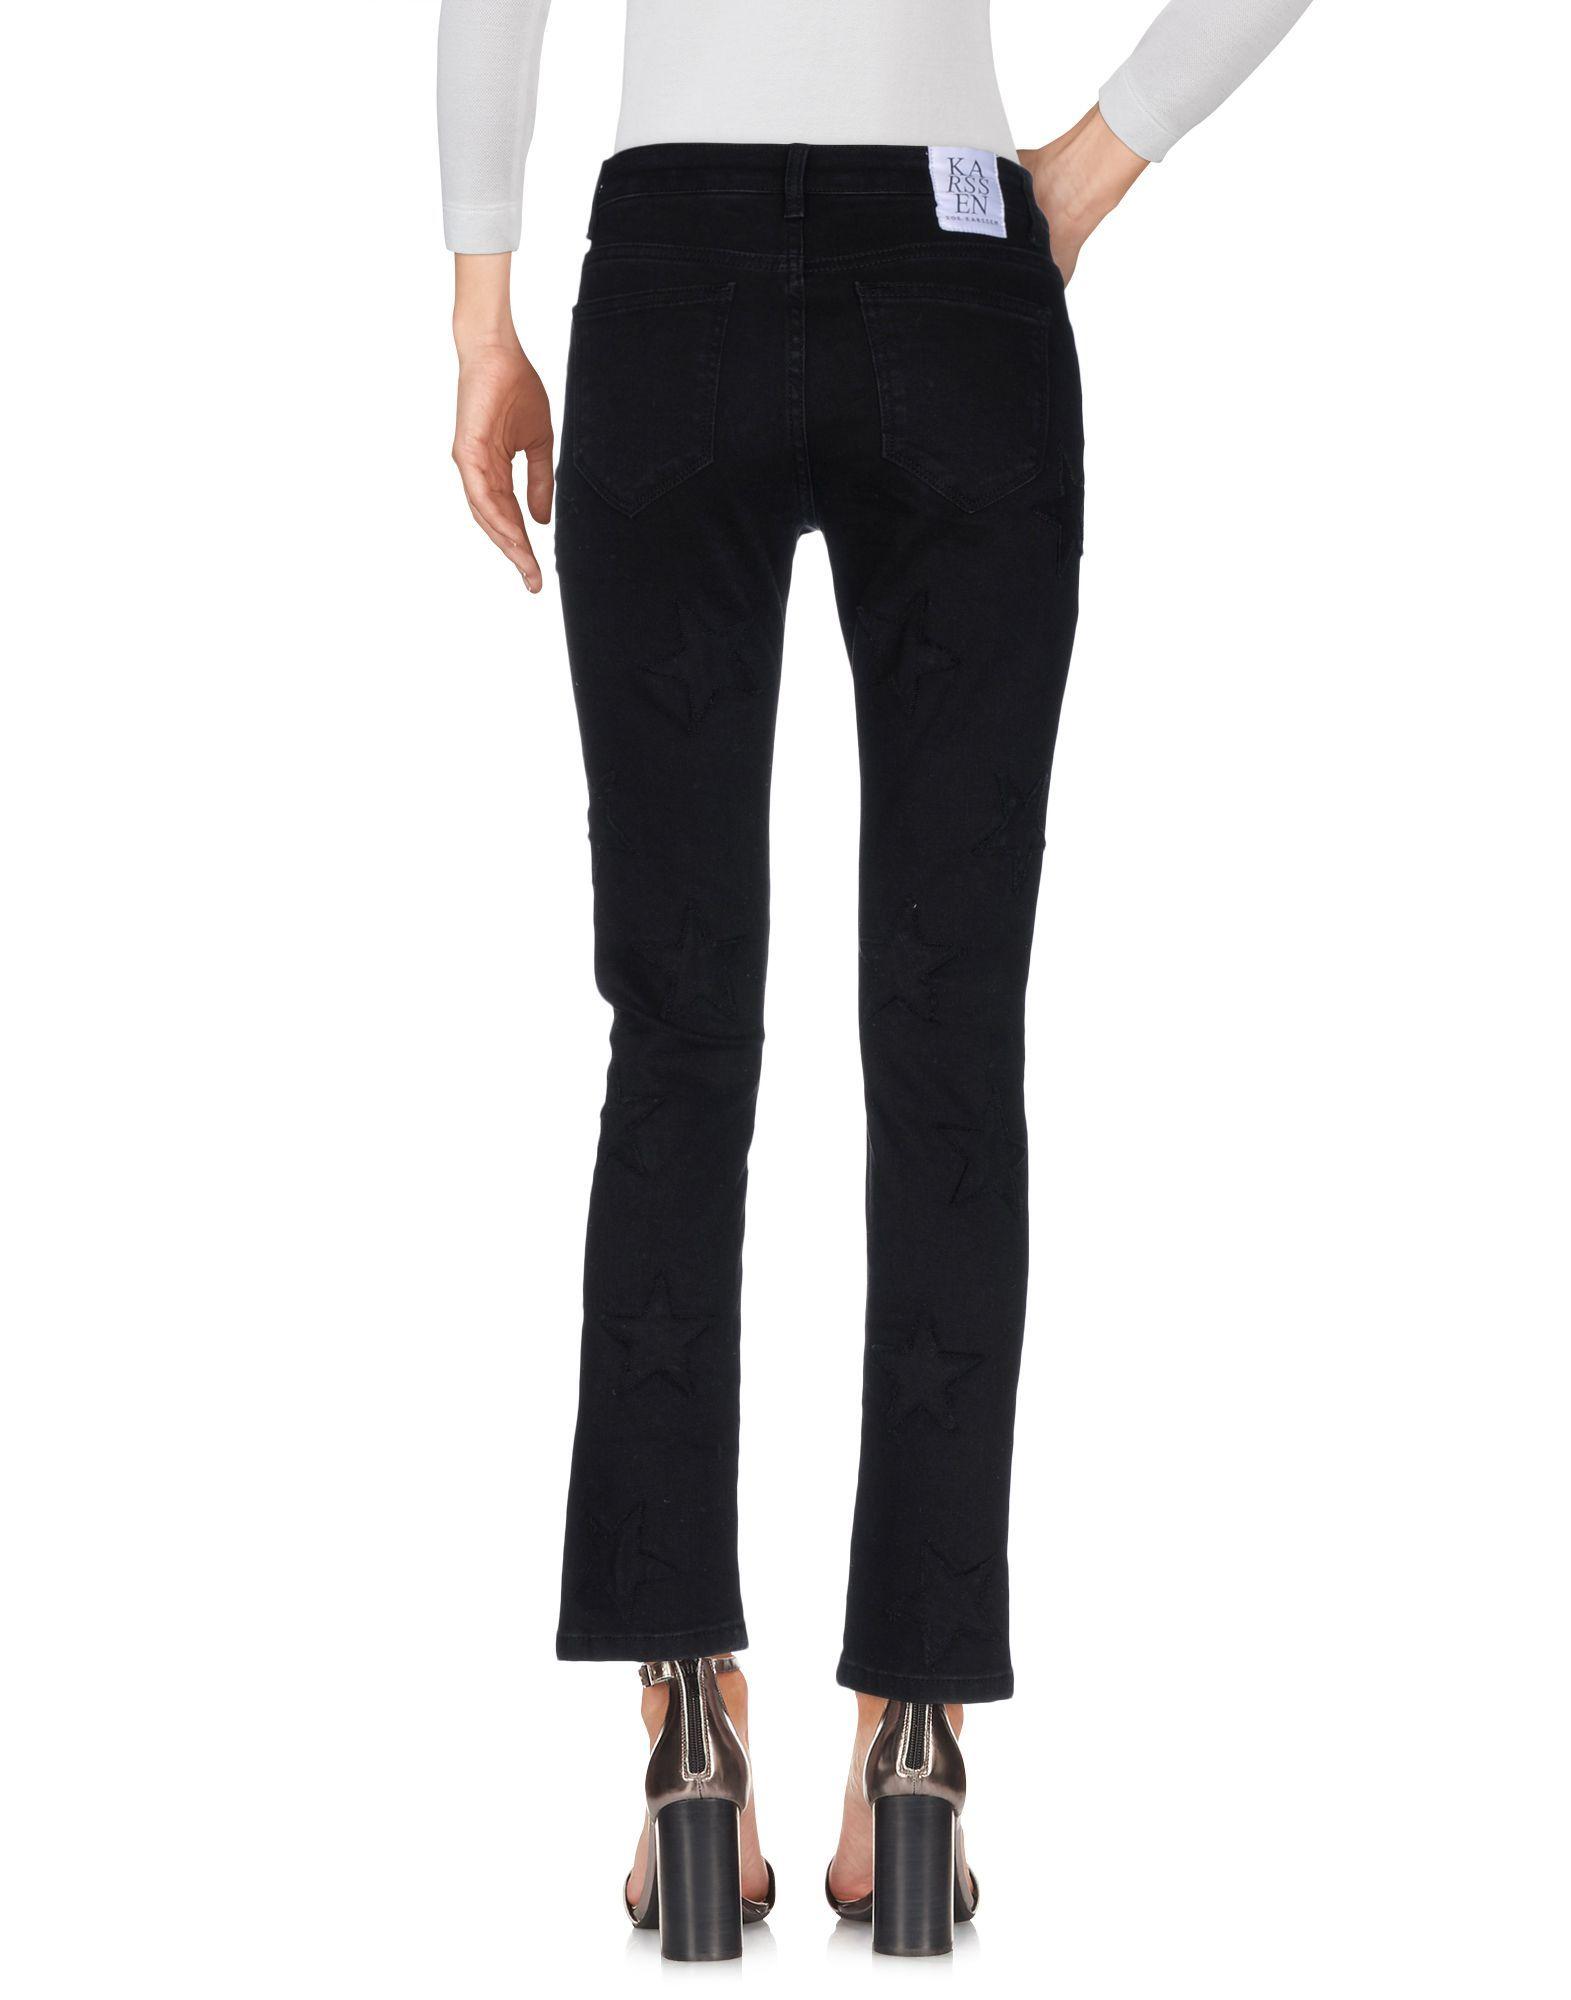 Zoe Karssen Black Cotton Straight Leg Jeans